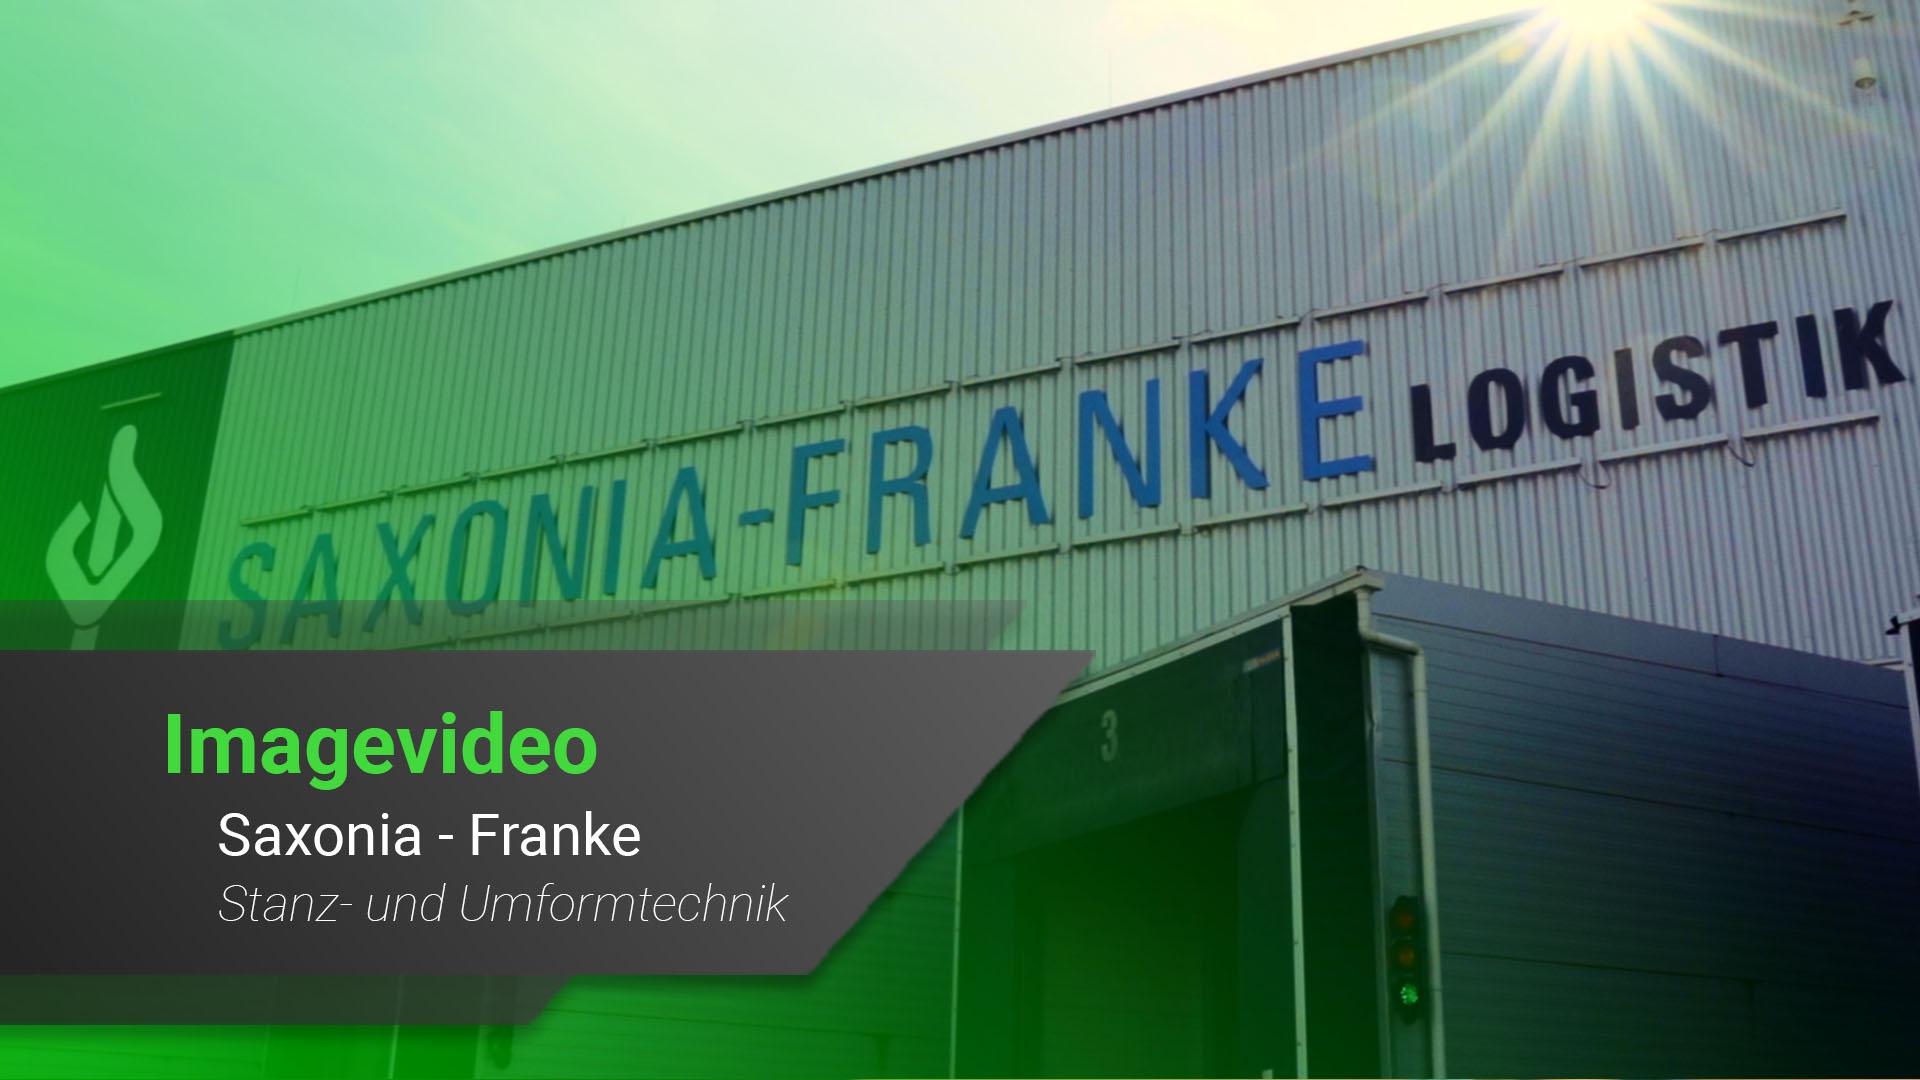 Saxonia - Franke